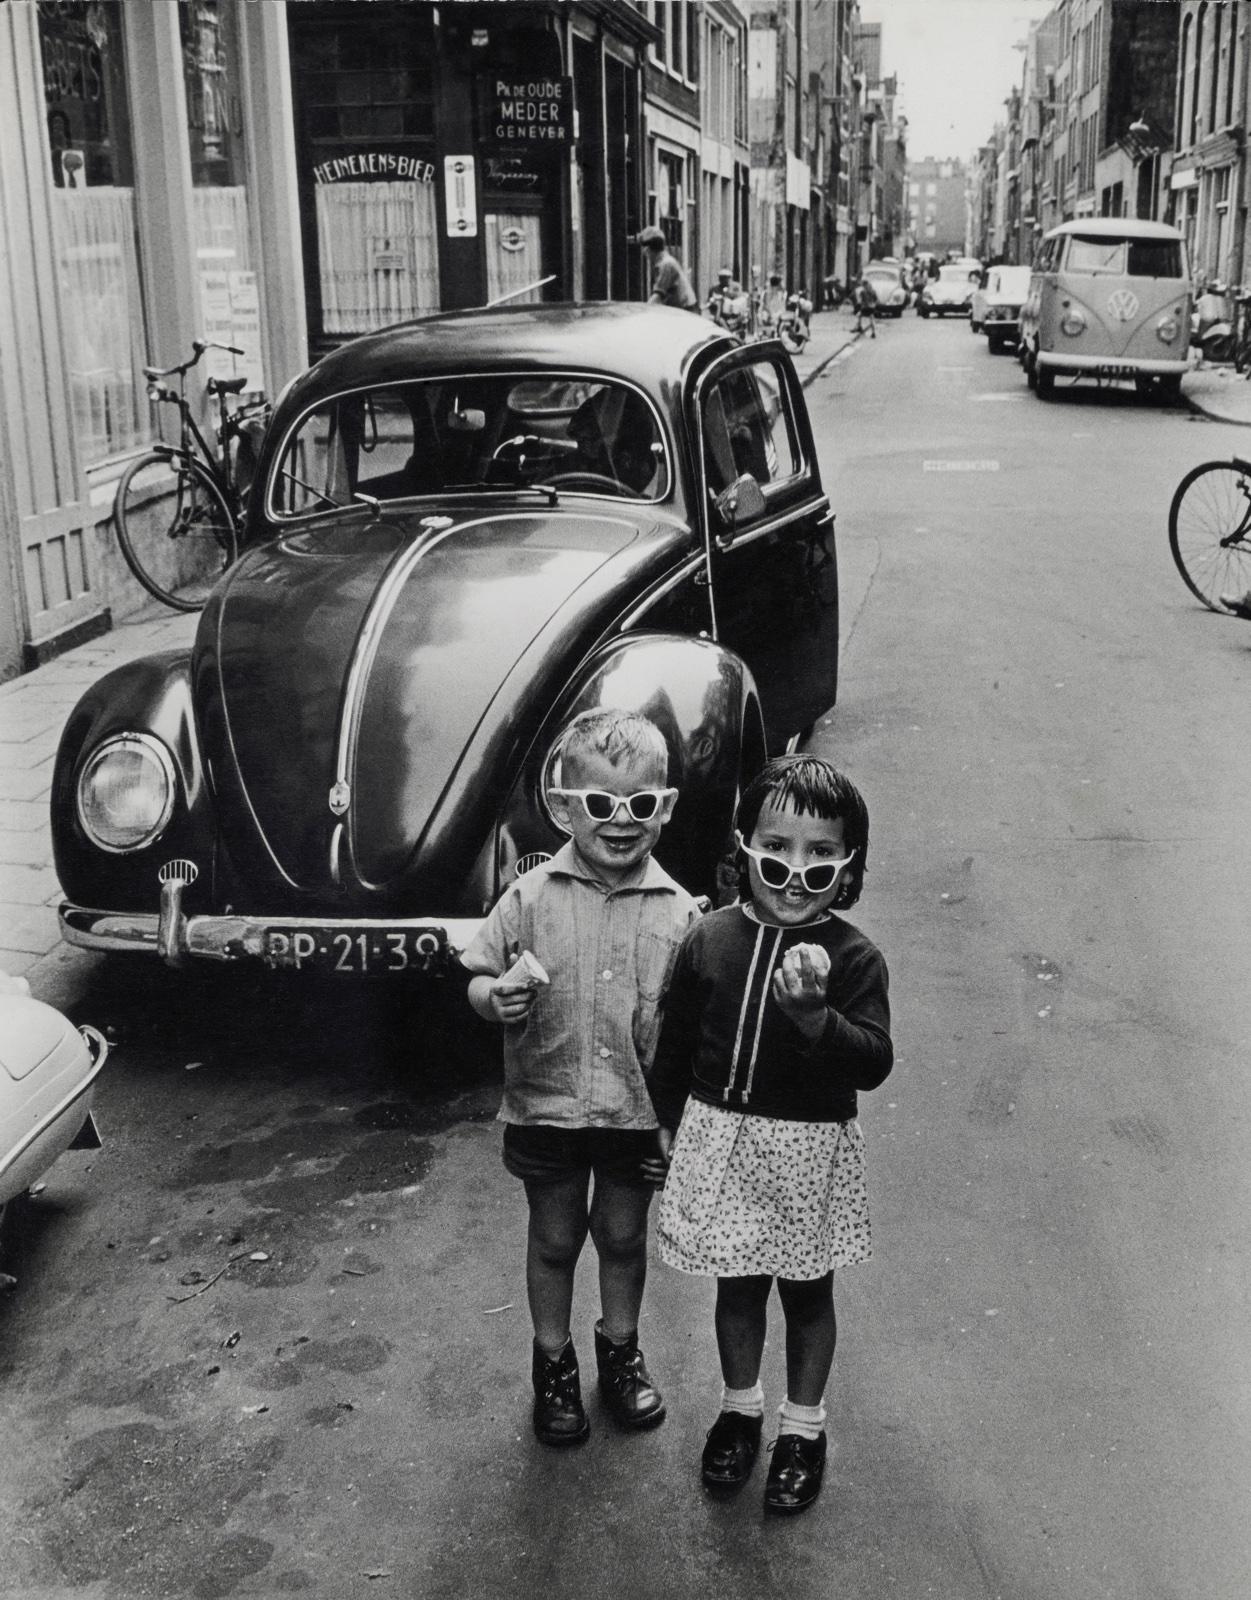 foto: Dolf Toussaint - Vinkenstraat, 1962-1963